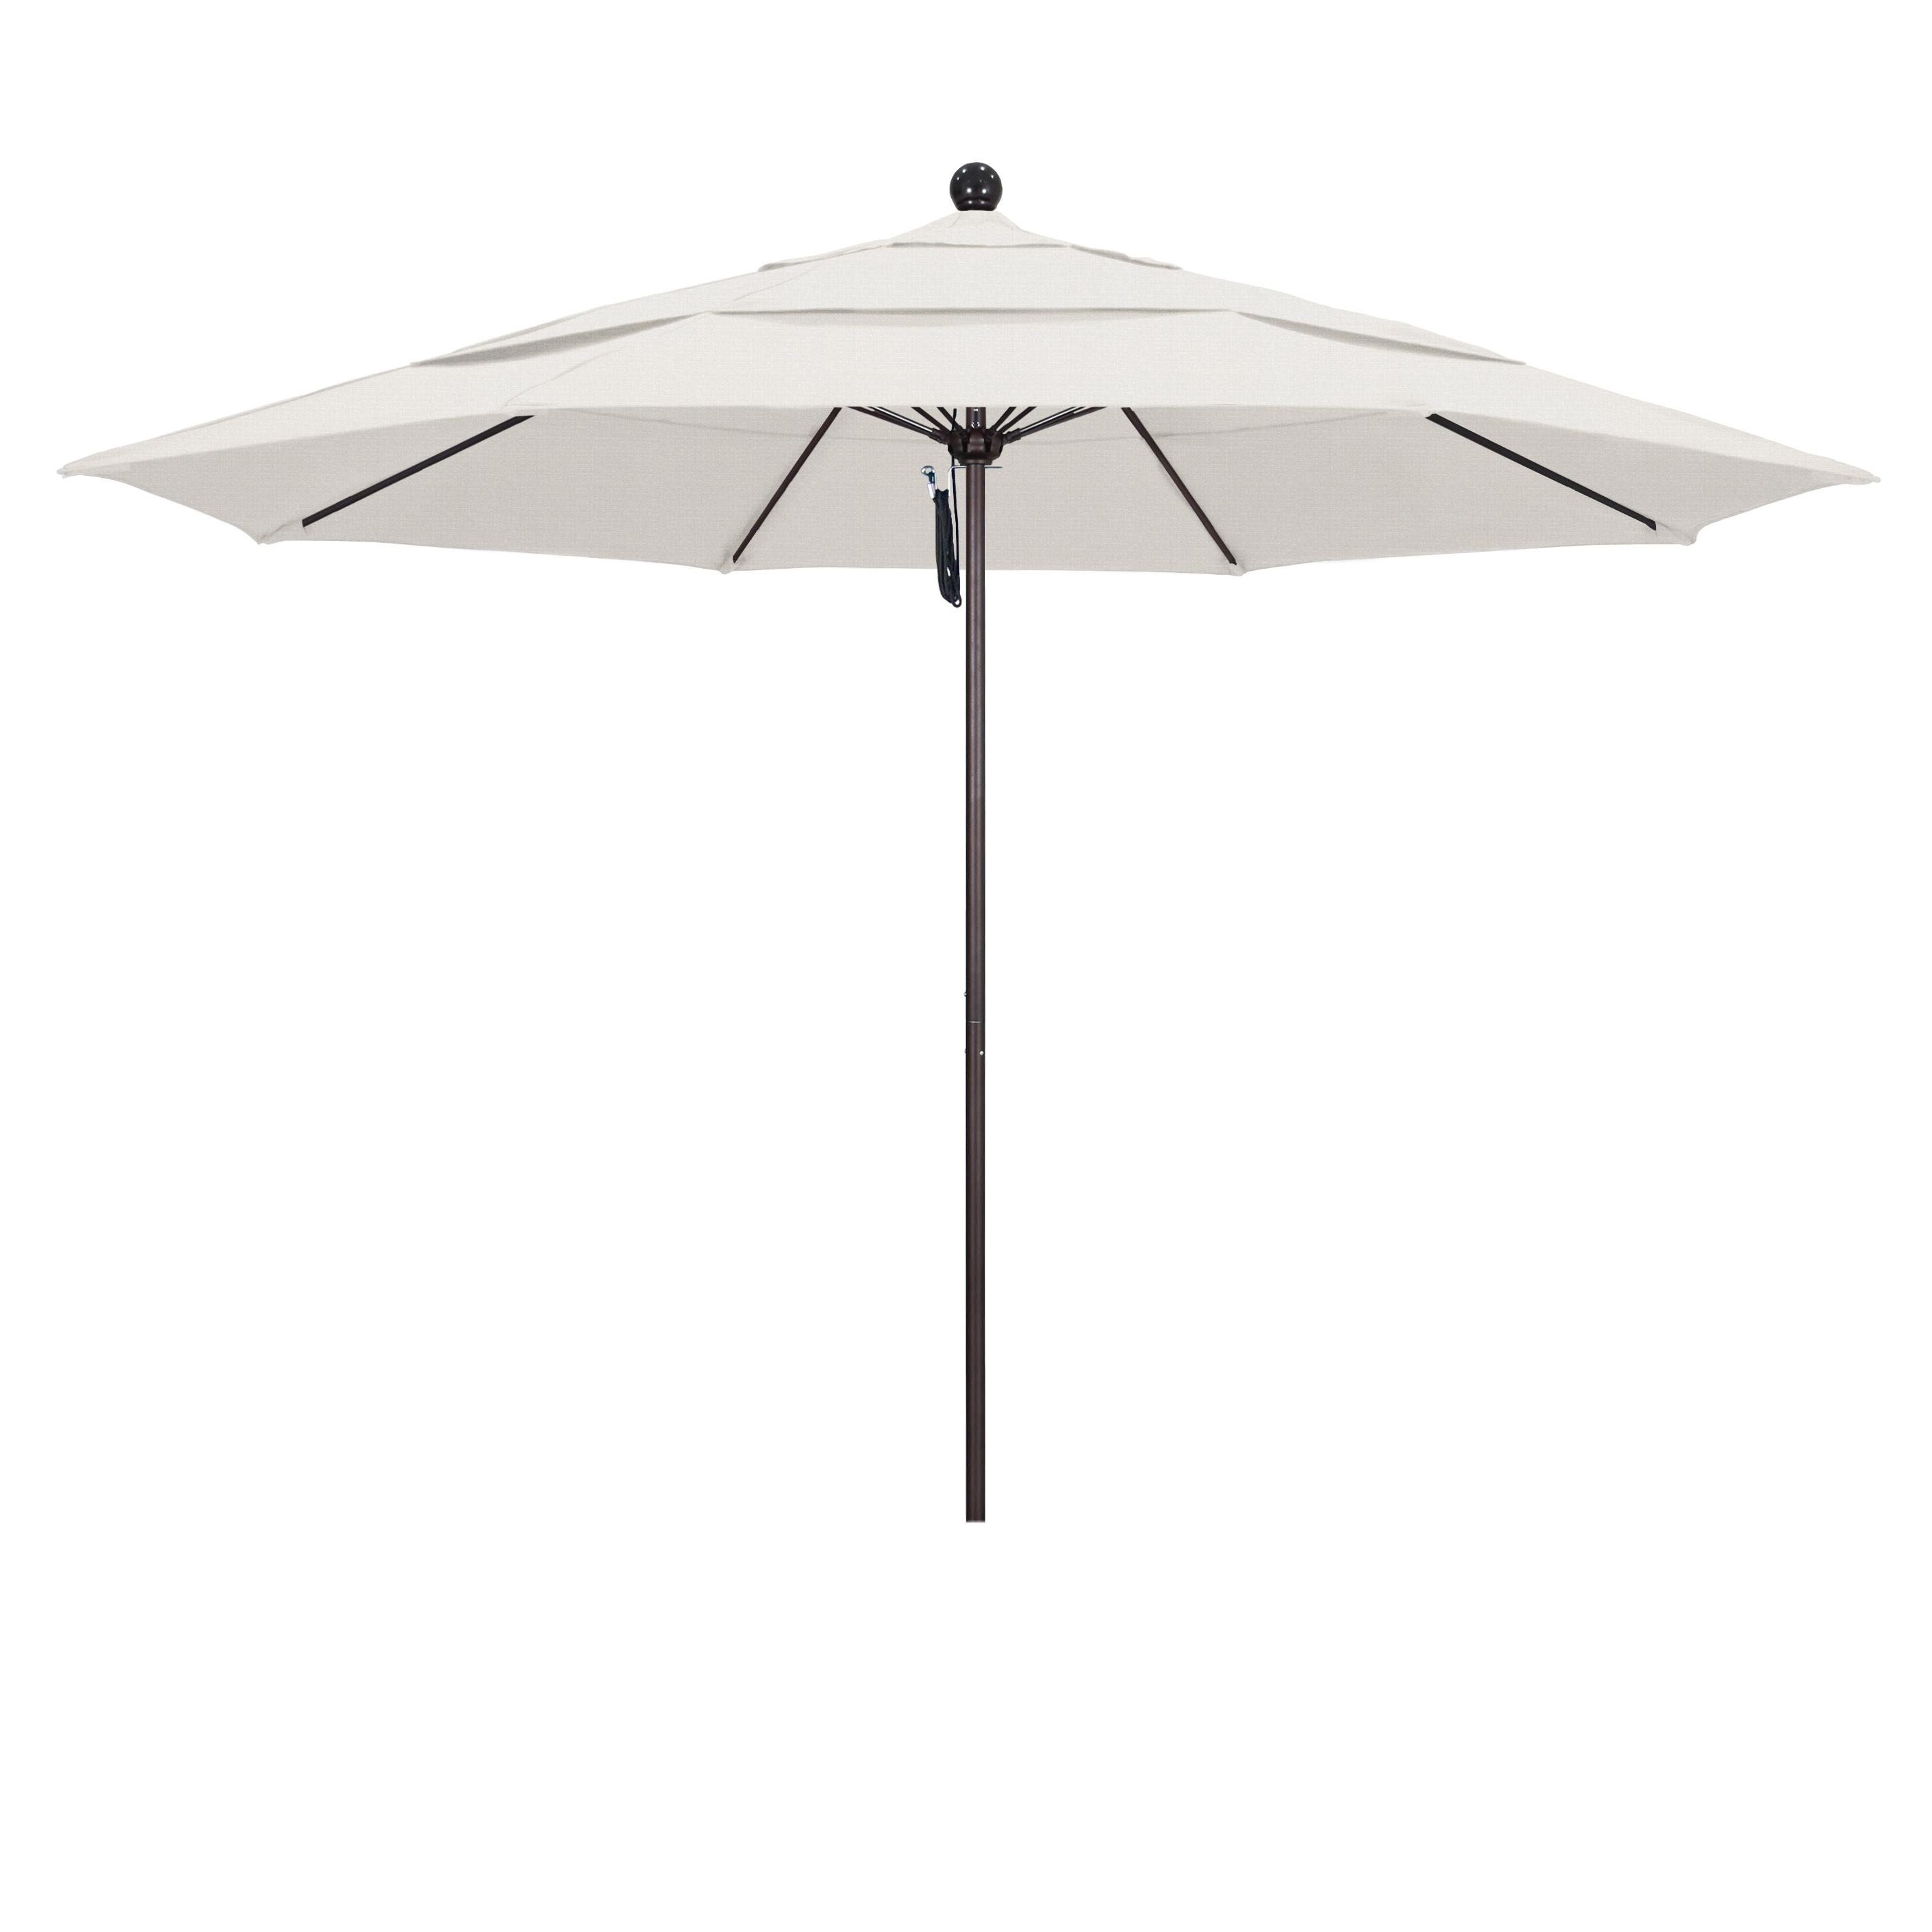 Most Popular Davenport 11' Market Umbrella Pertaining To Caravelle Market Umbrellas (View 13 of 20)